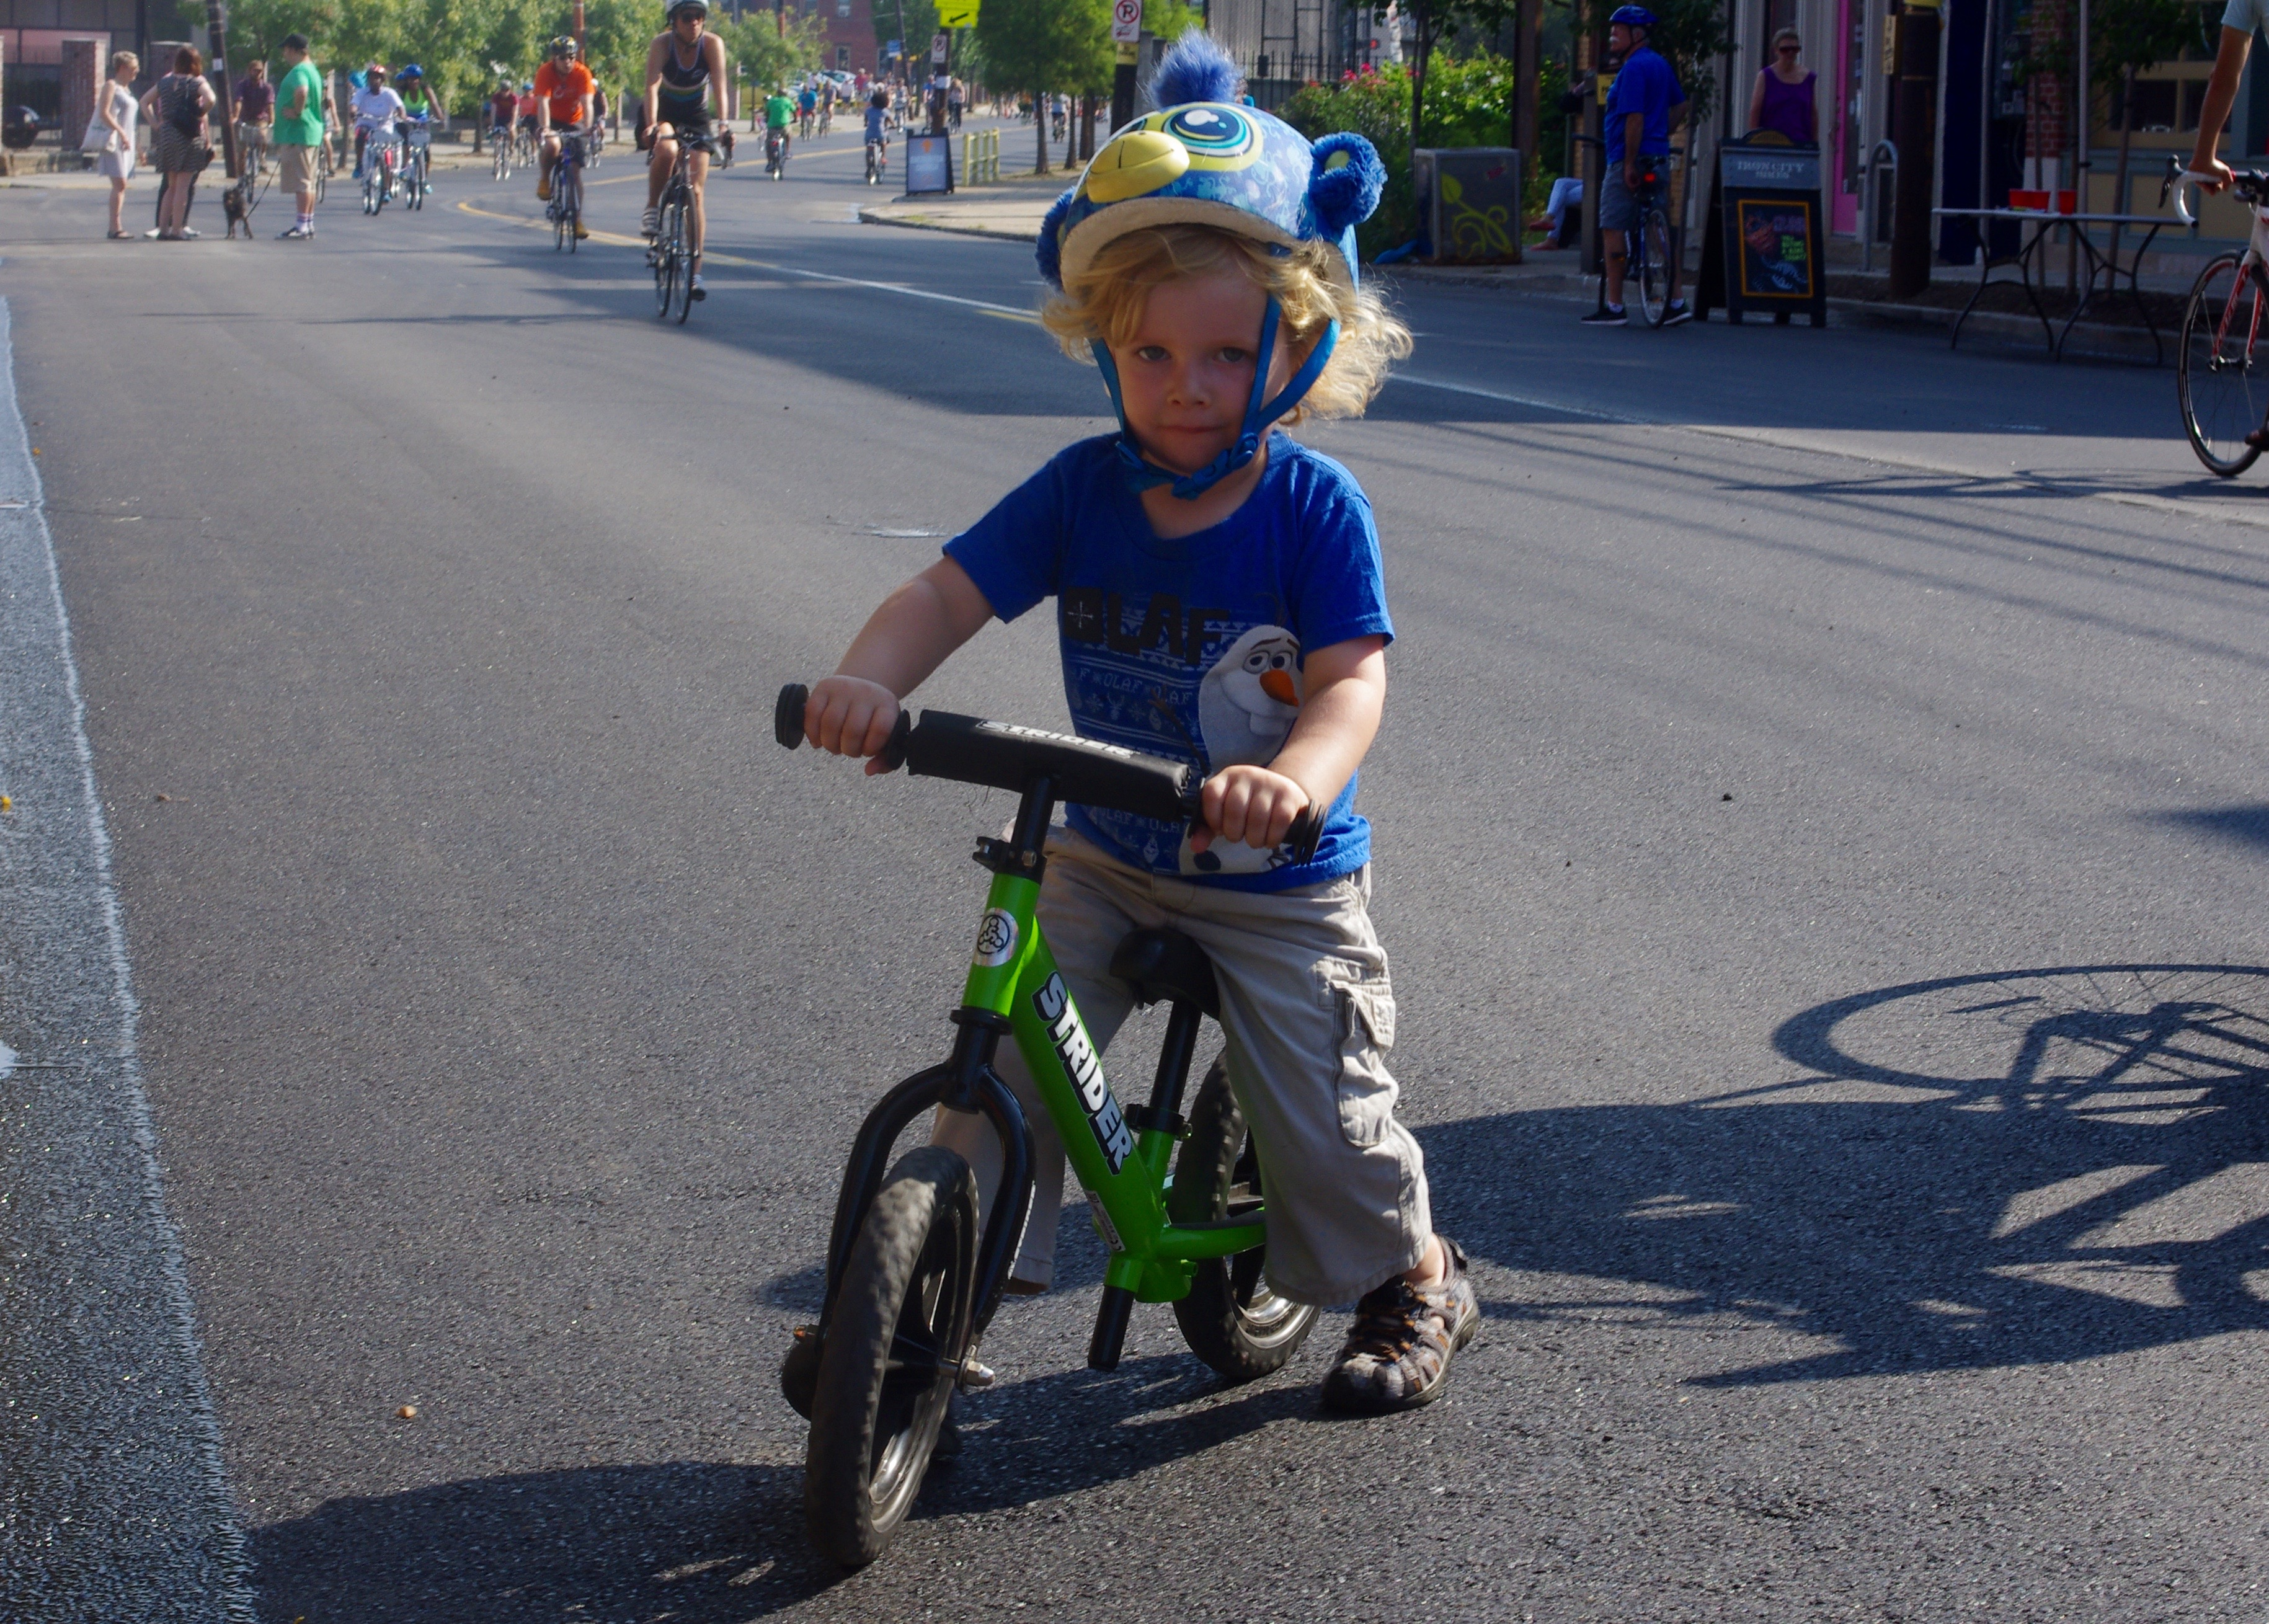 Three-year-old August Merriman-Preston is ready to ride on his Strider bike.